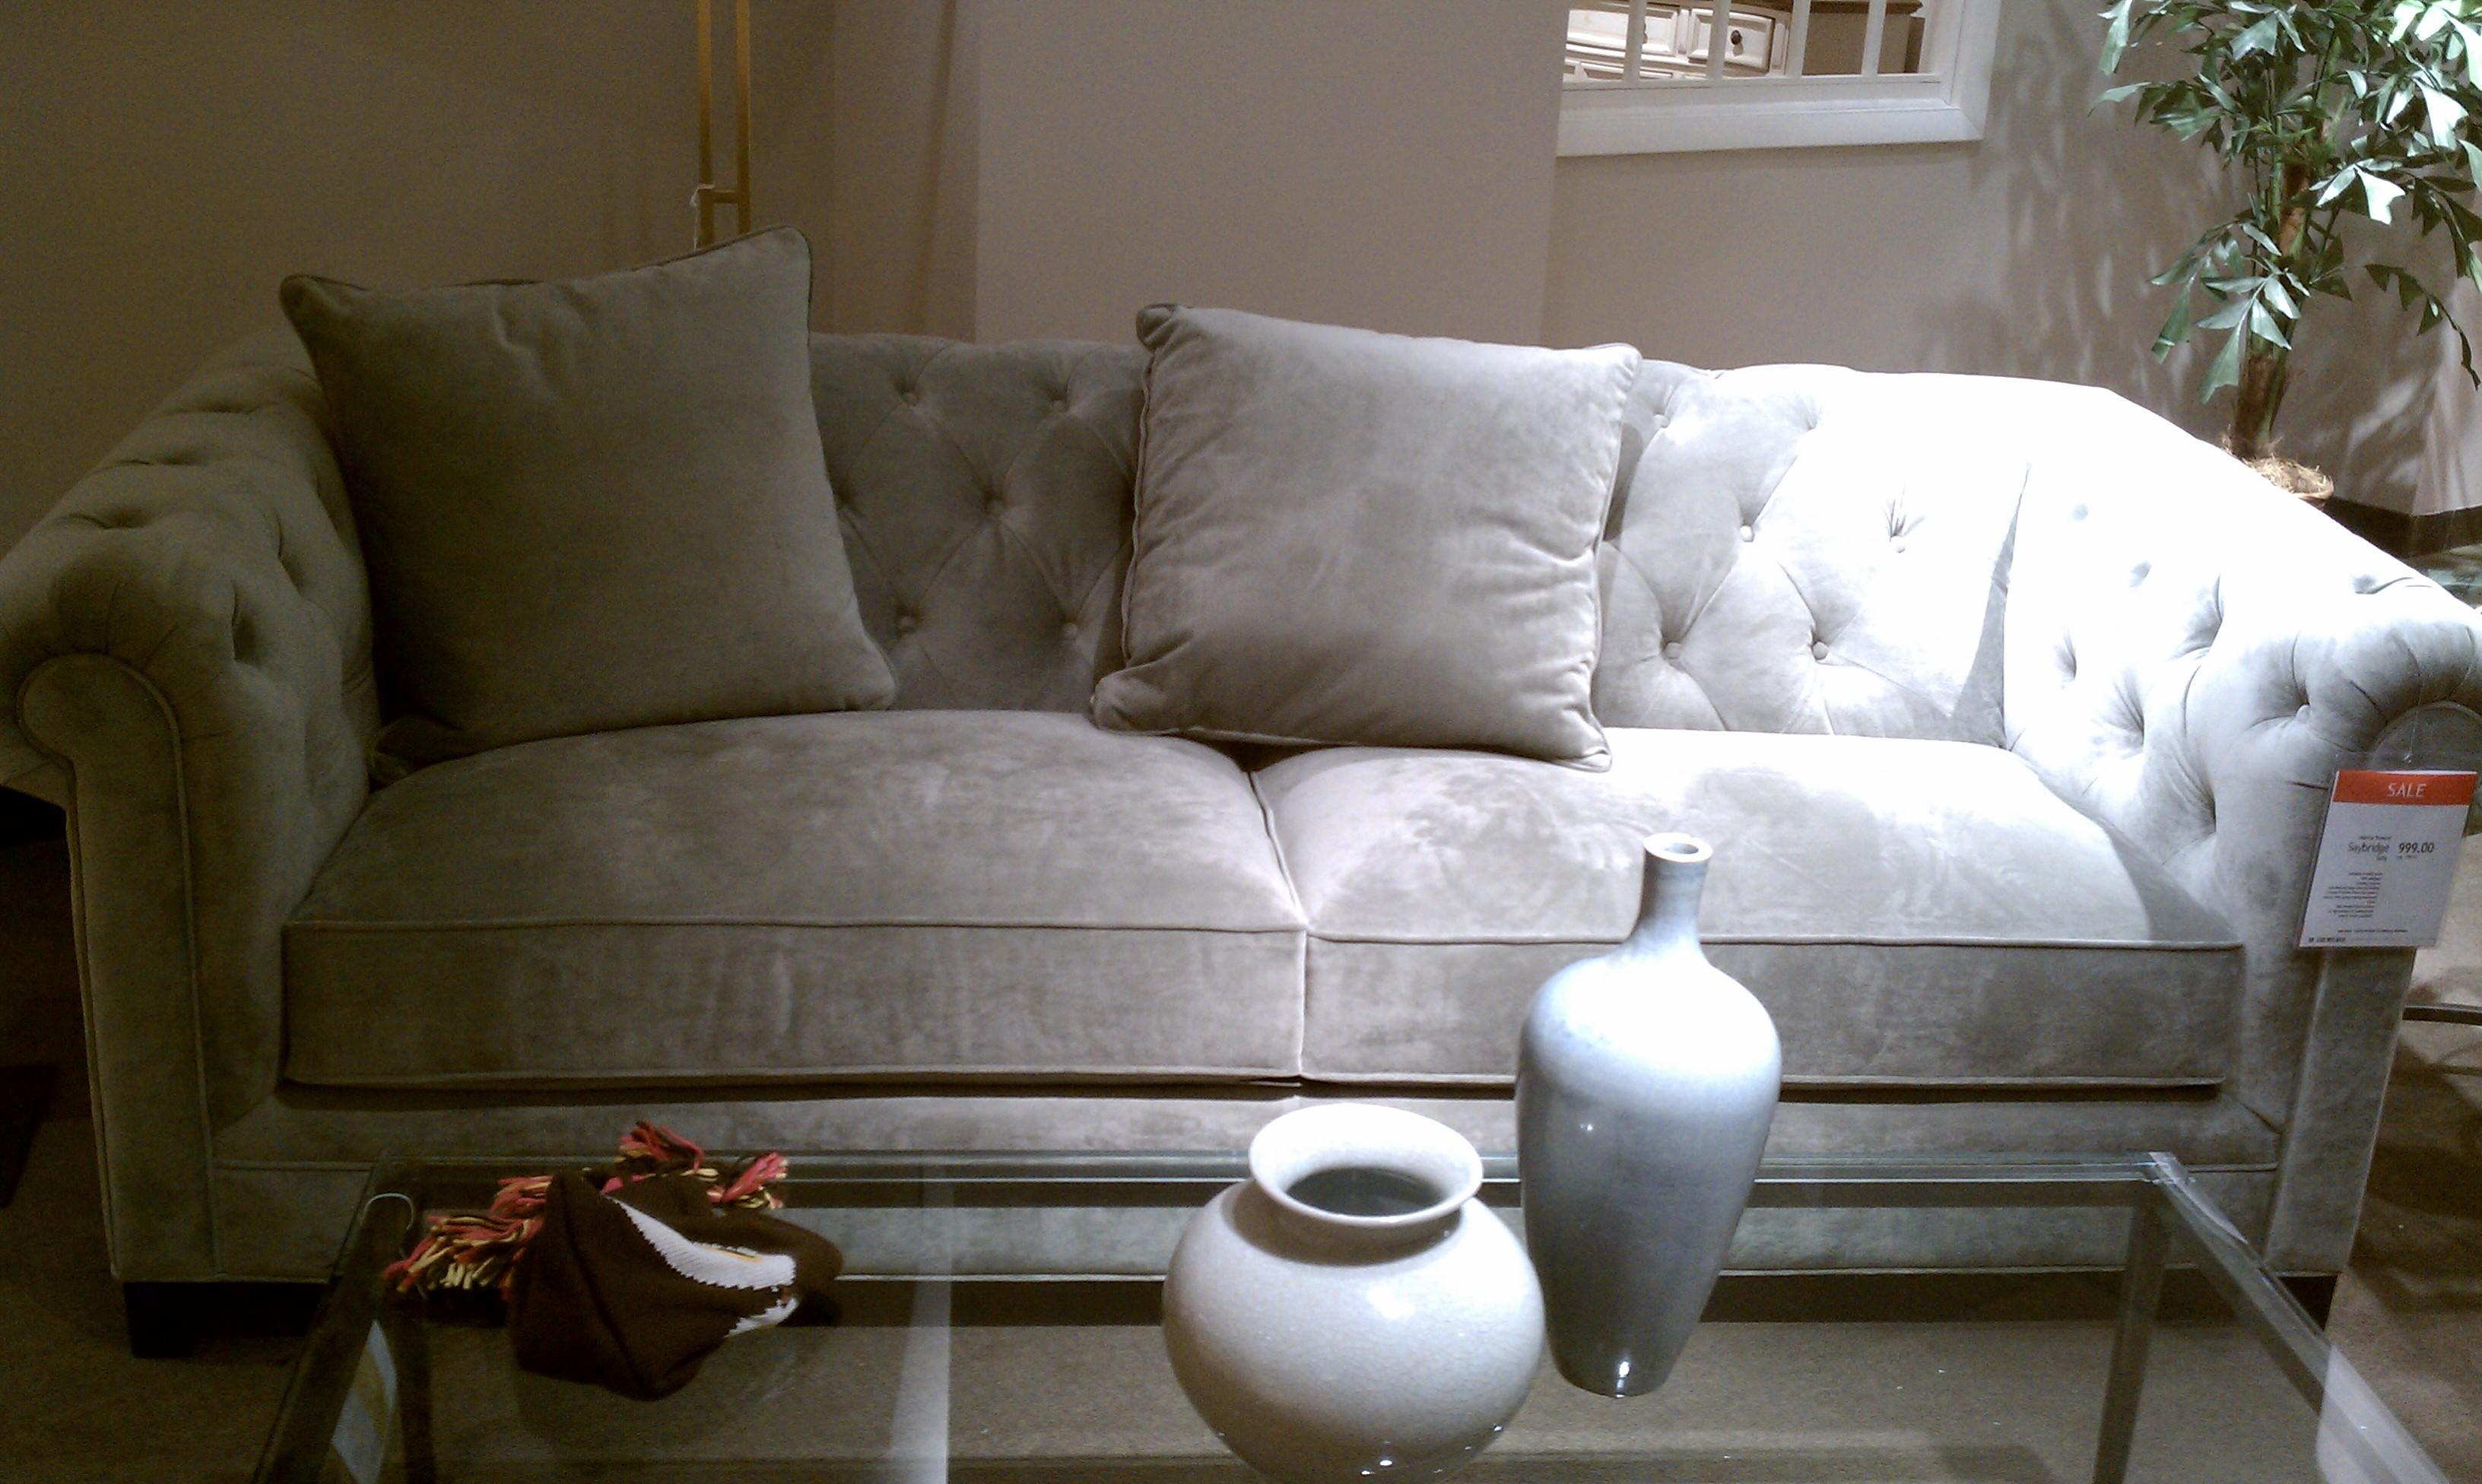 martha stewart sofa saybridge review beds greenock random monday a bad case of the furnitures thediynewlywed